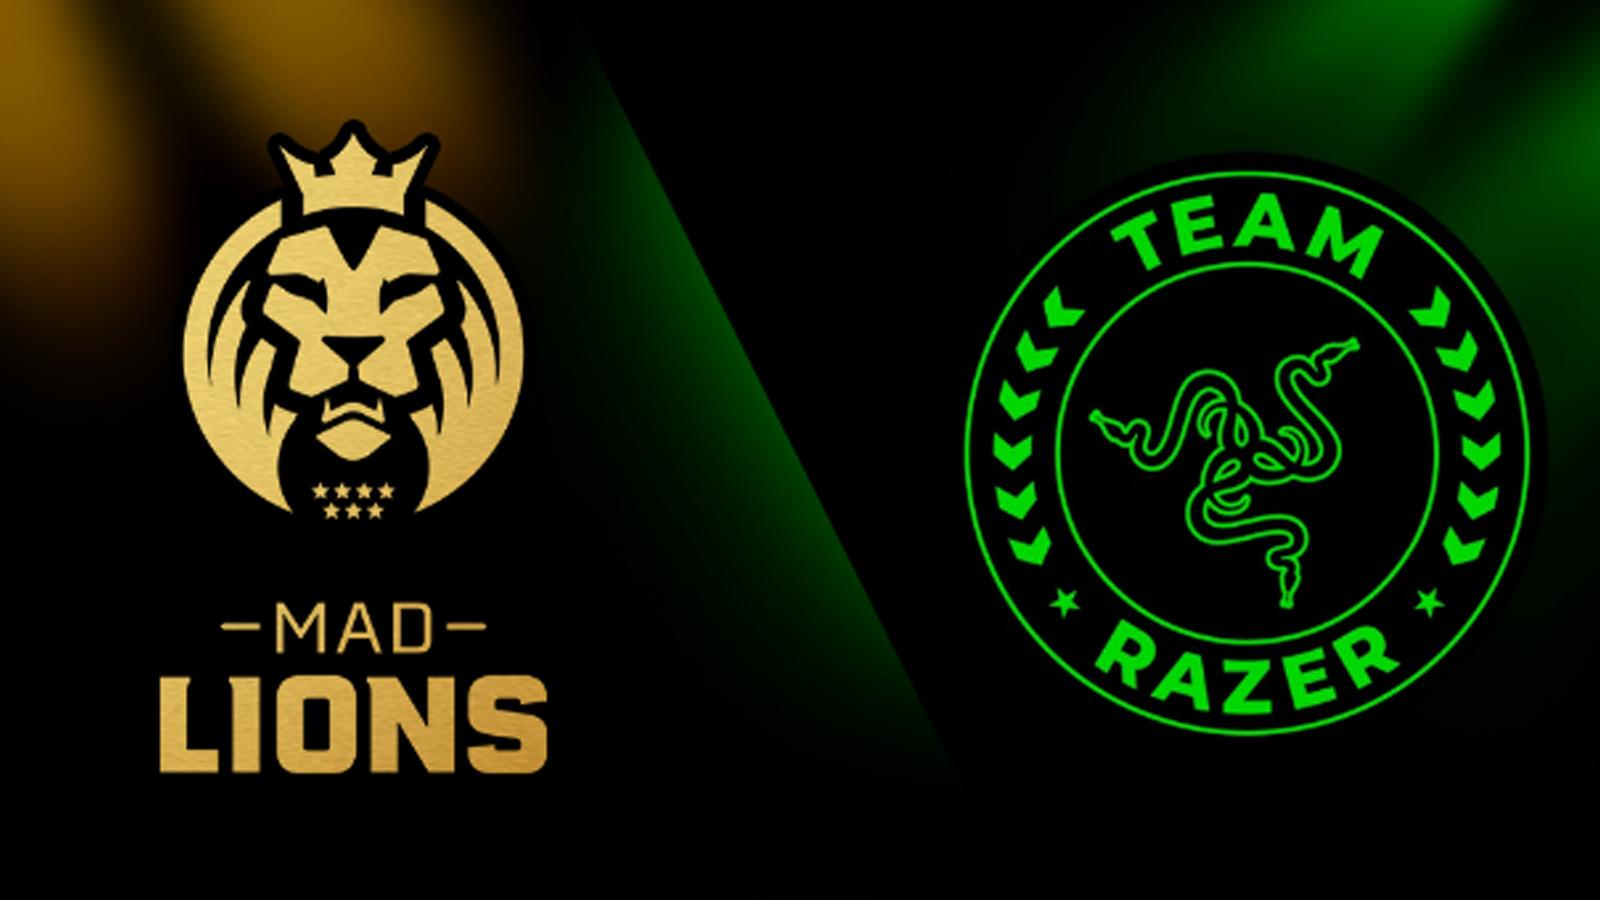 Razer nuevo sponsor de MAD Lions Esports